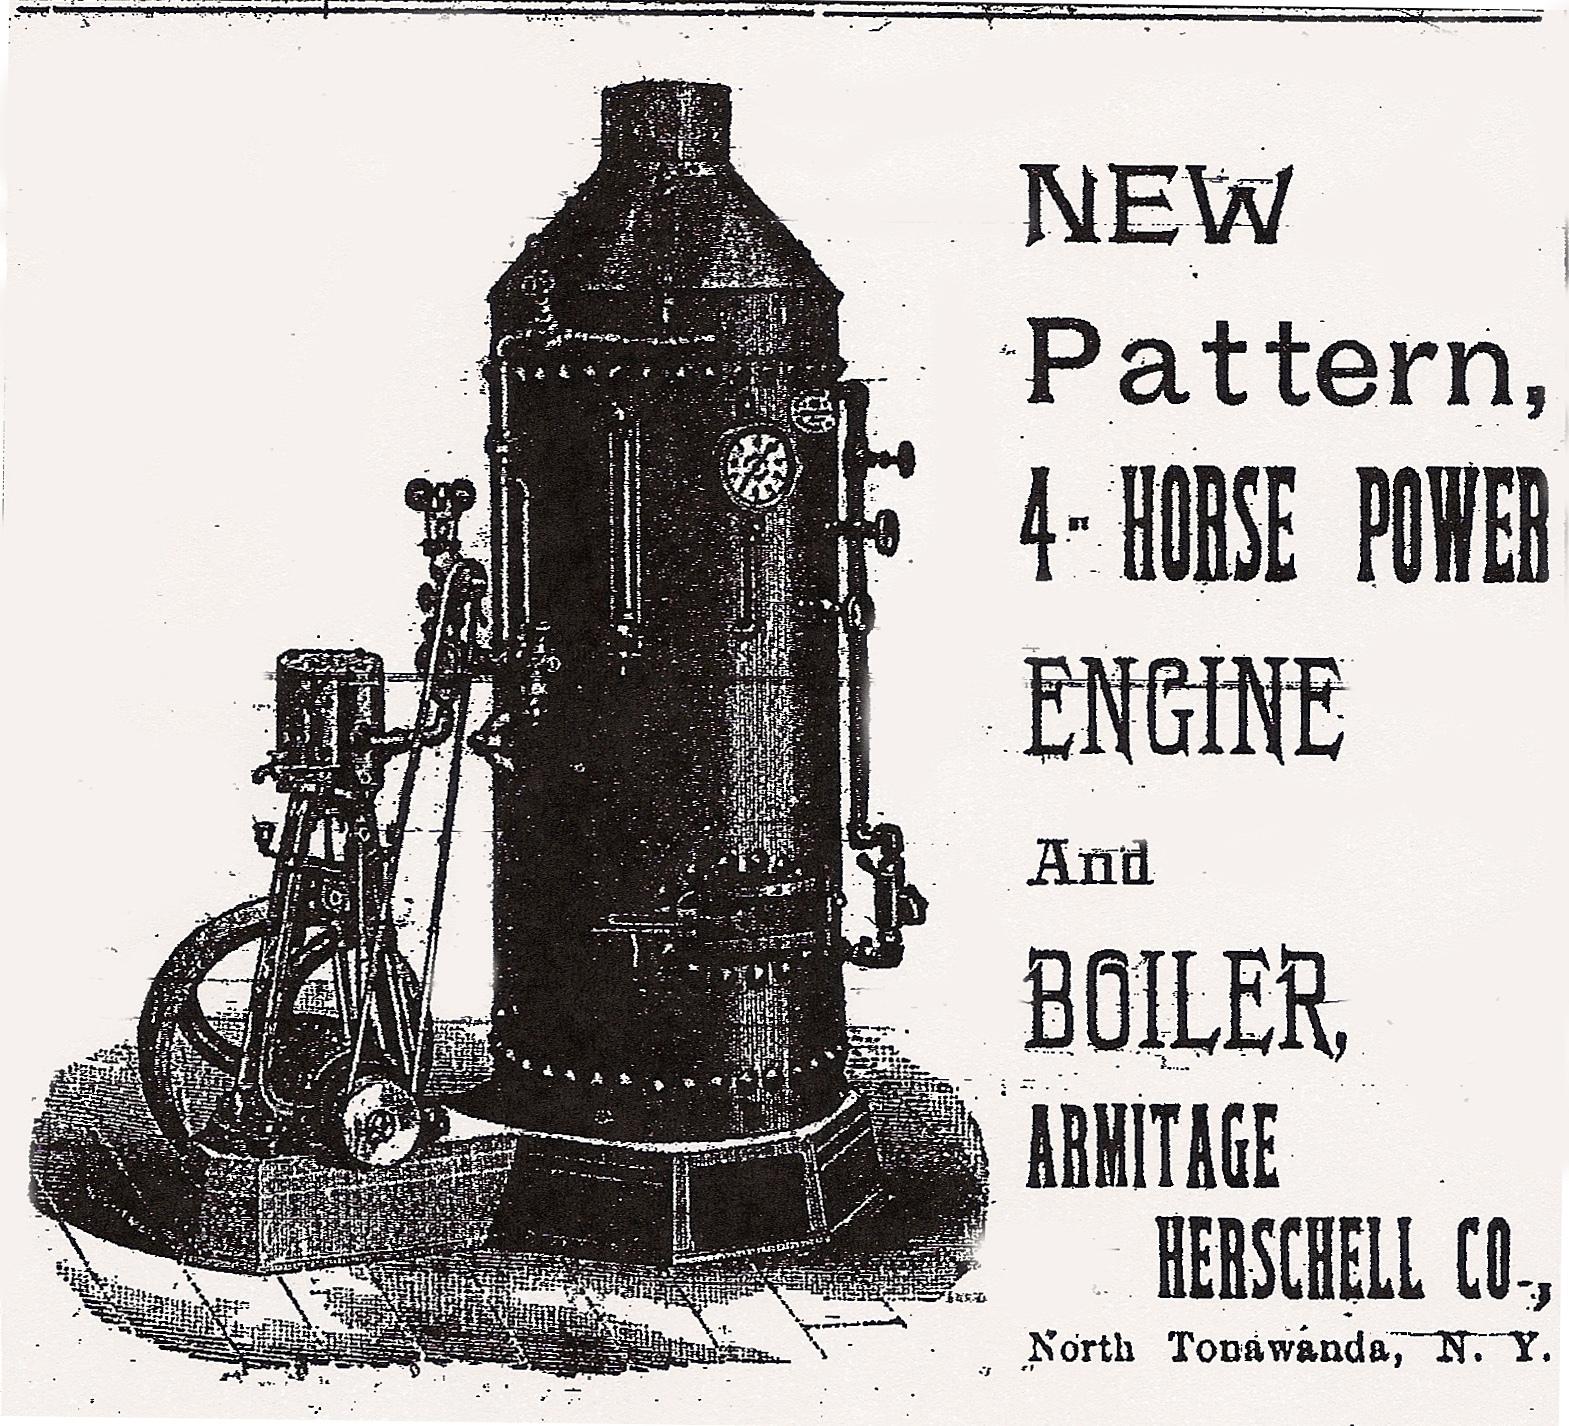 4-horse power engine and boiler, Armitage Herschell, ad (Tonawanda News, 1894.jpg